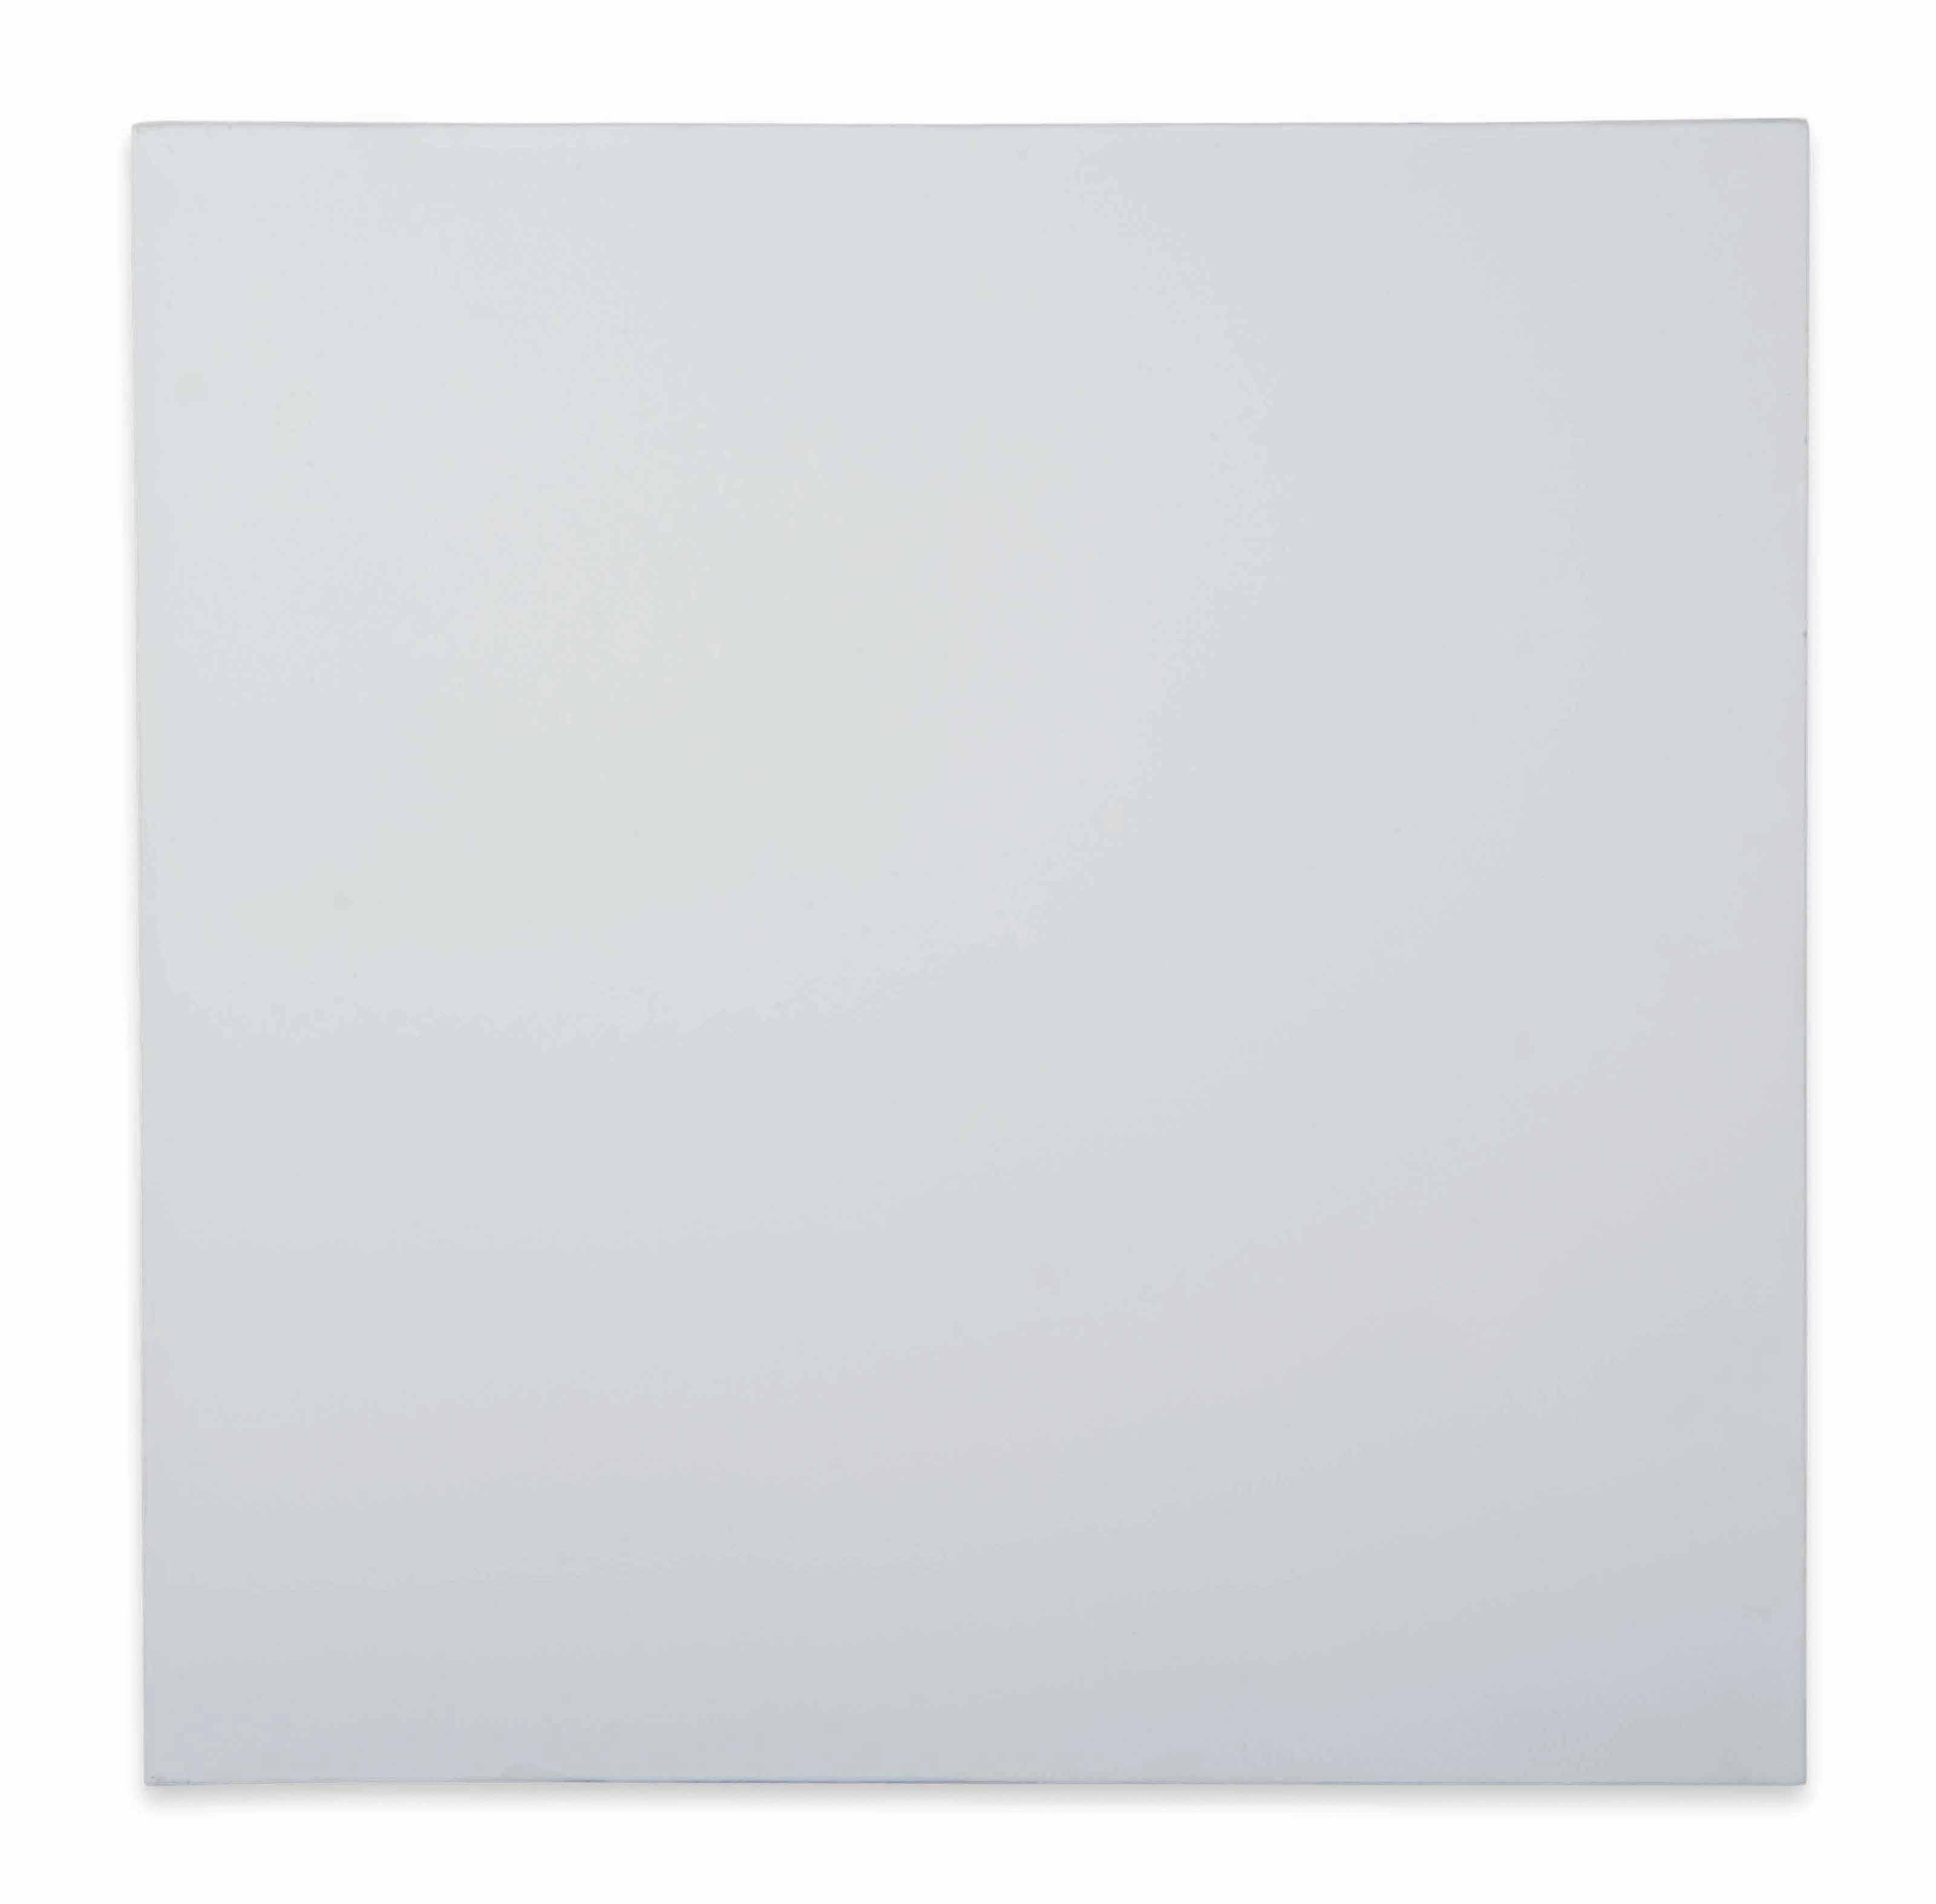 Monochrome blanc (Monochrome White)